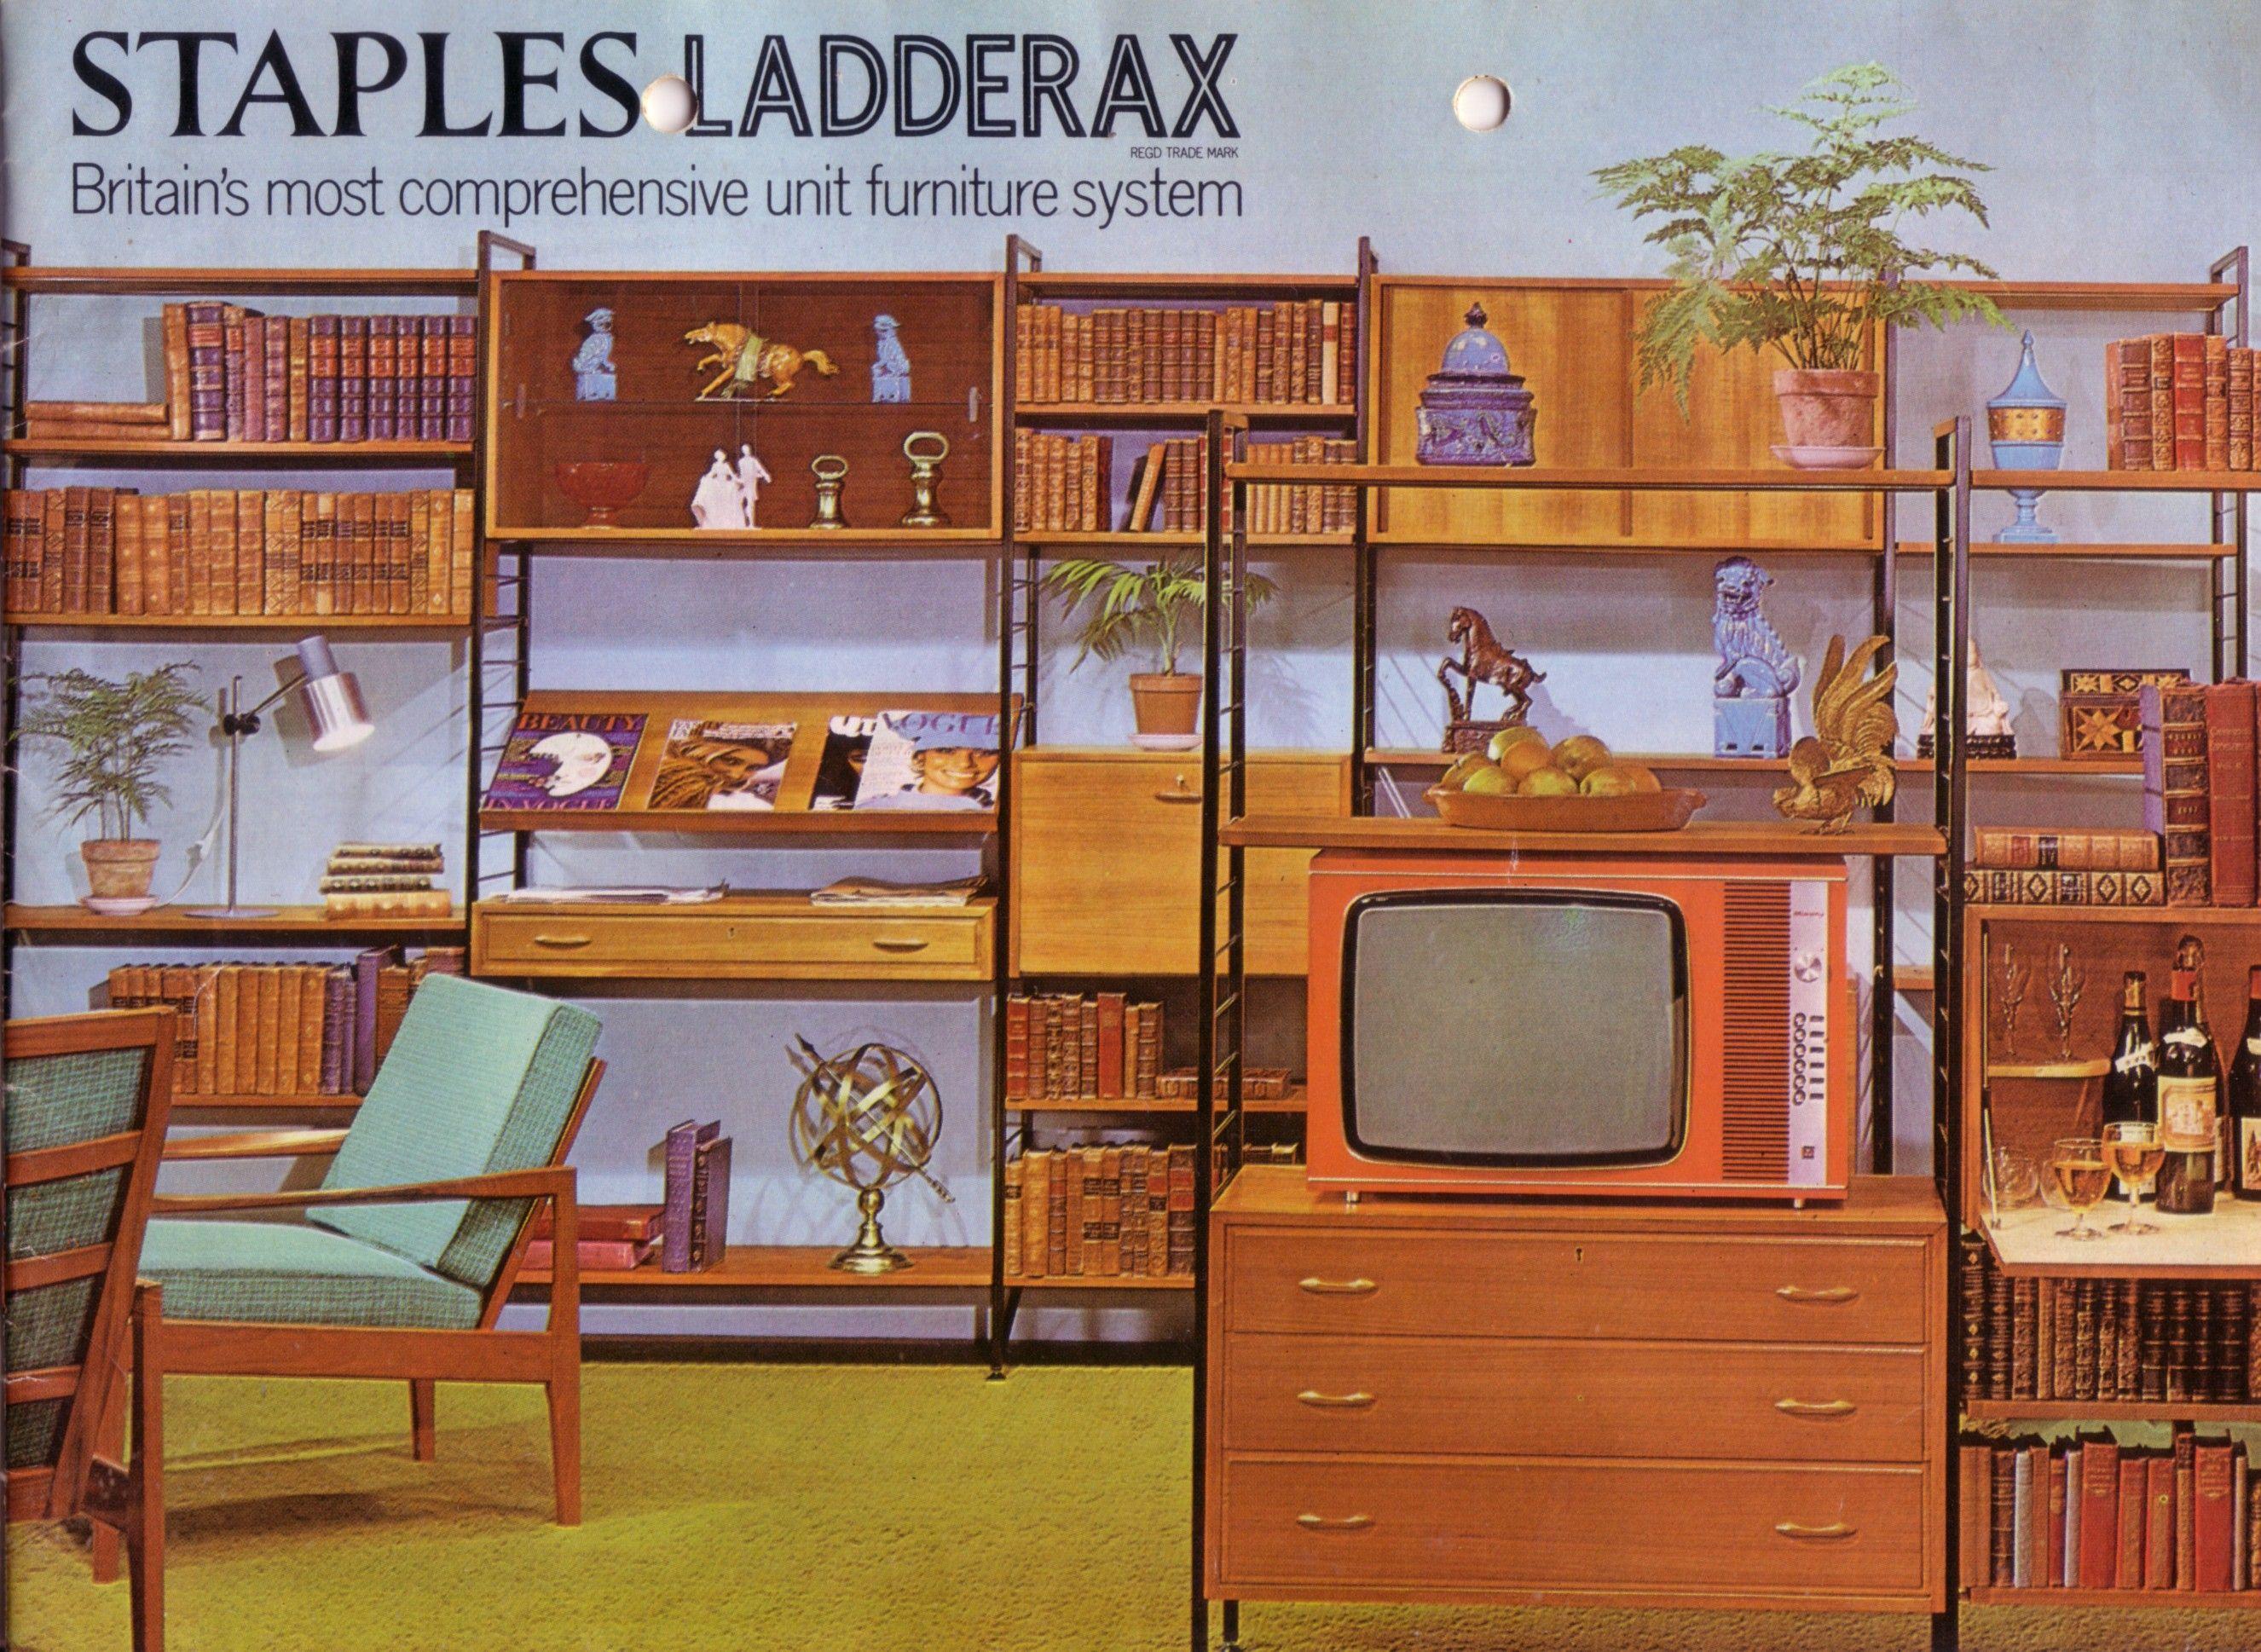 Staples Ladderax Modular Furniture System Catalogue Cover